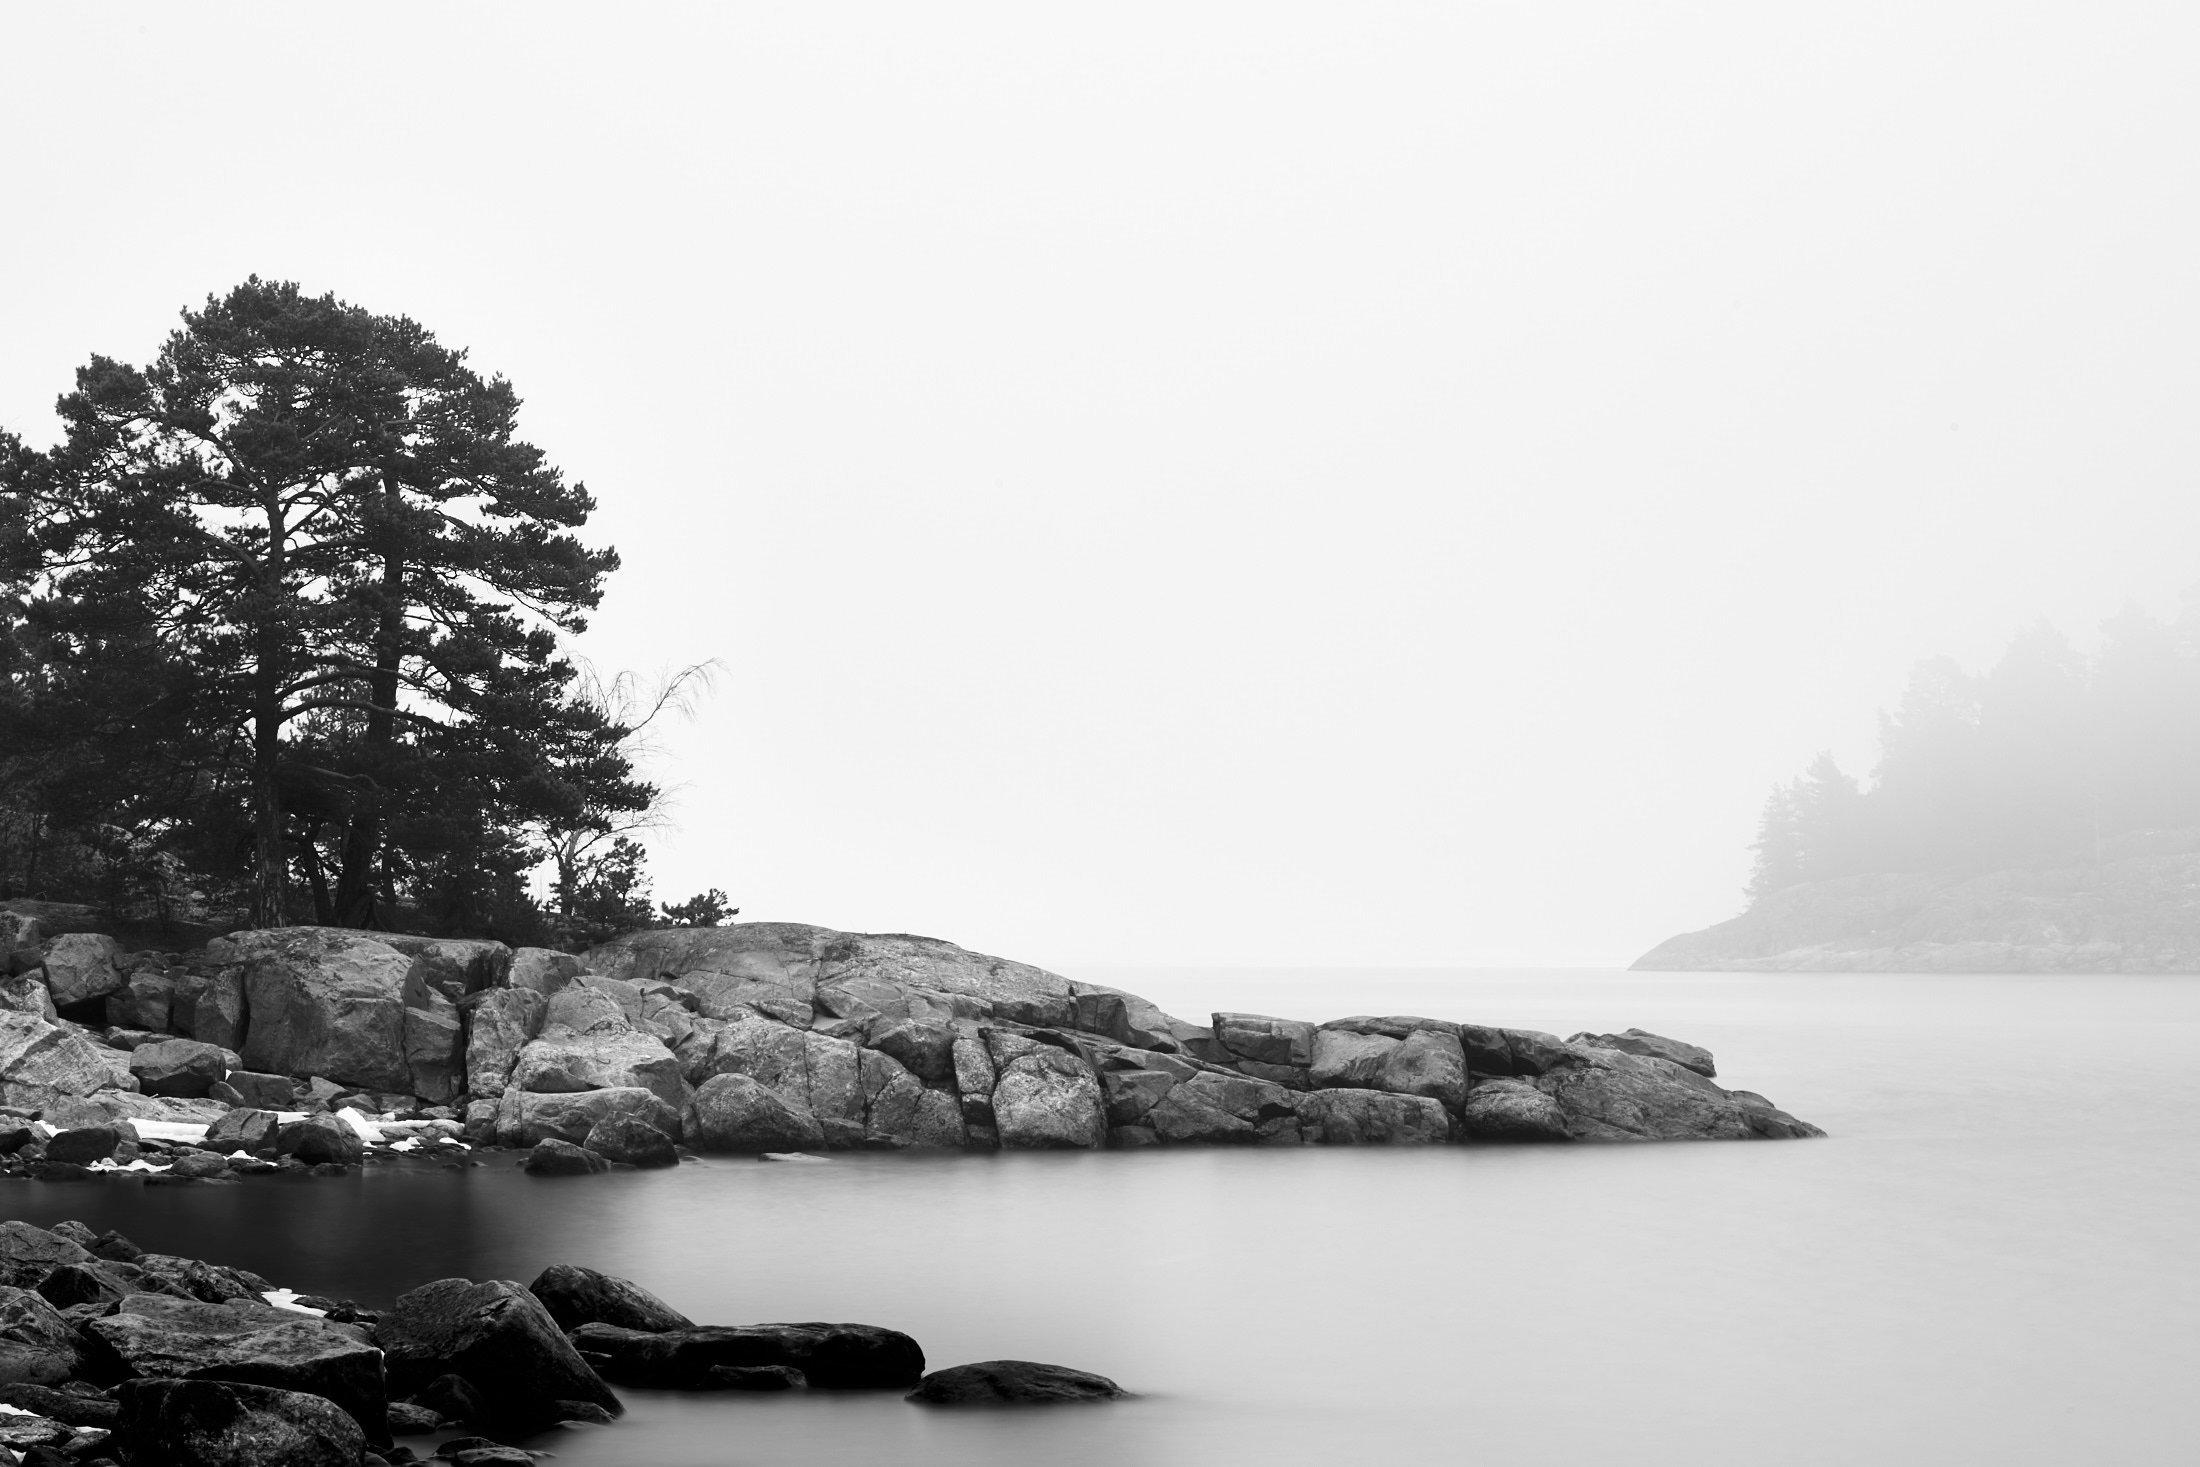 Morning Mist between the Islands